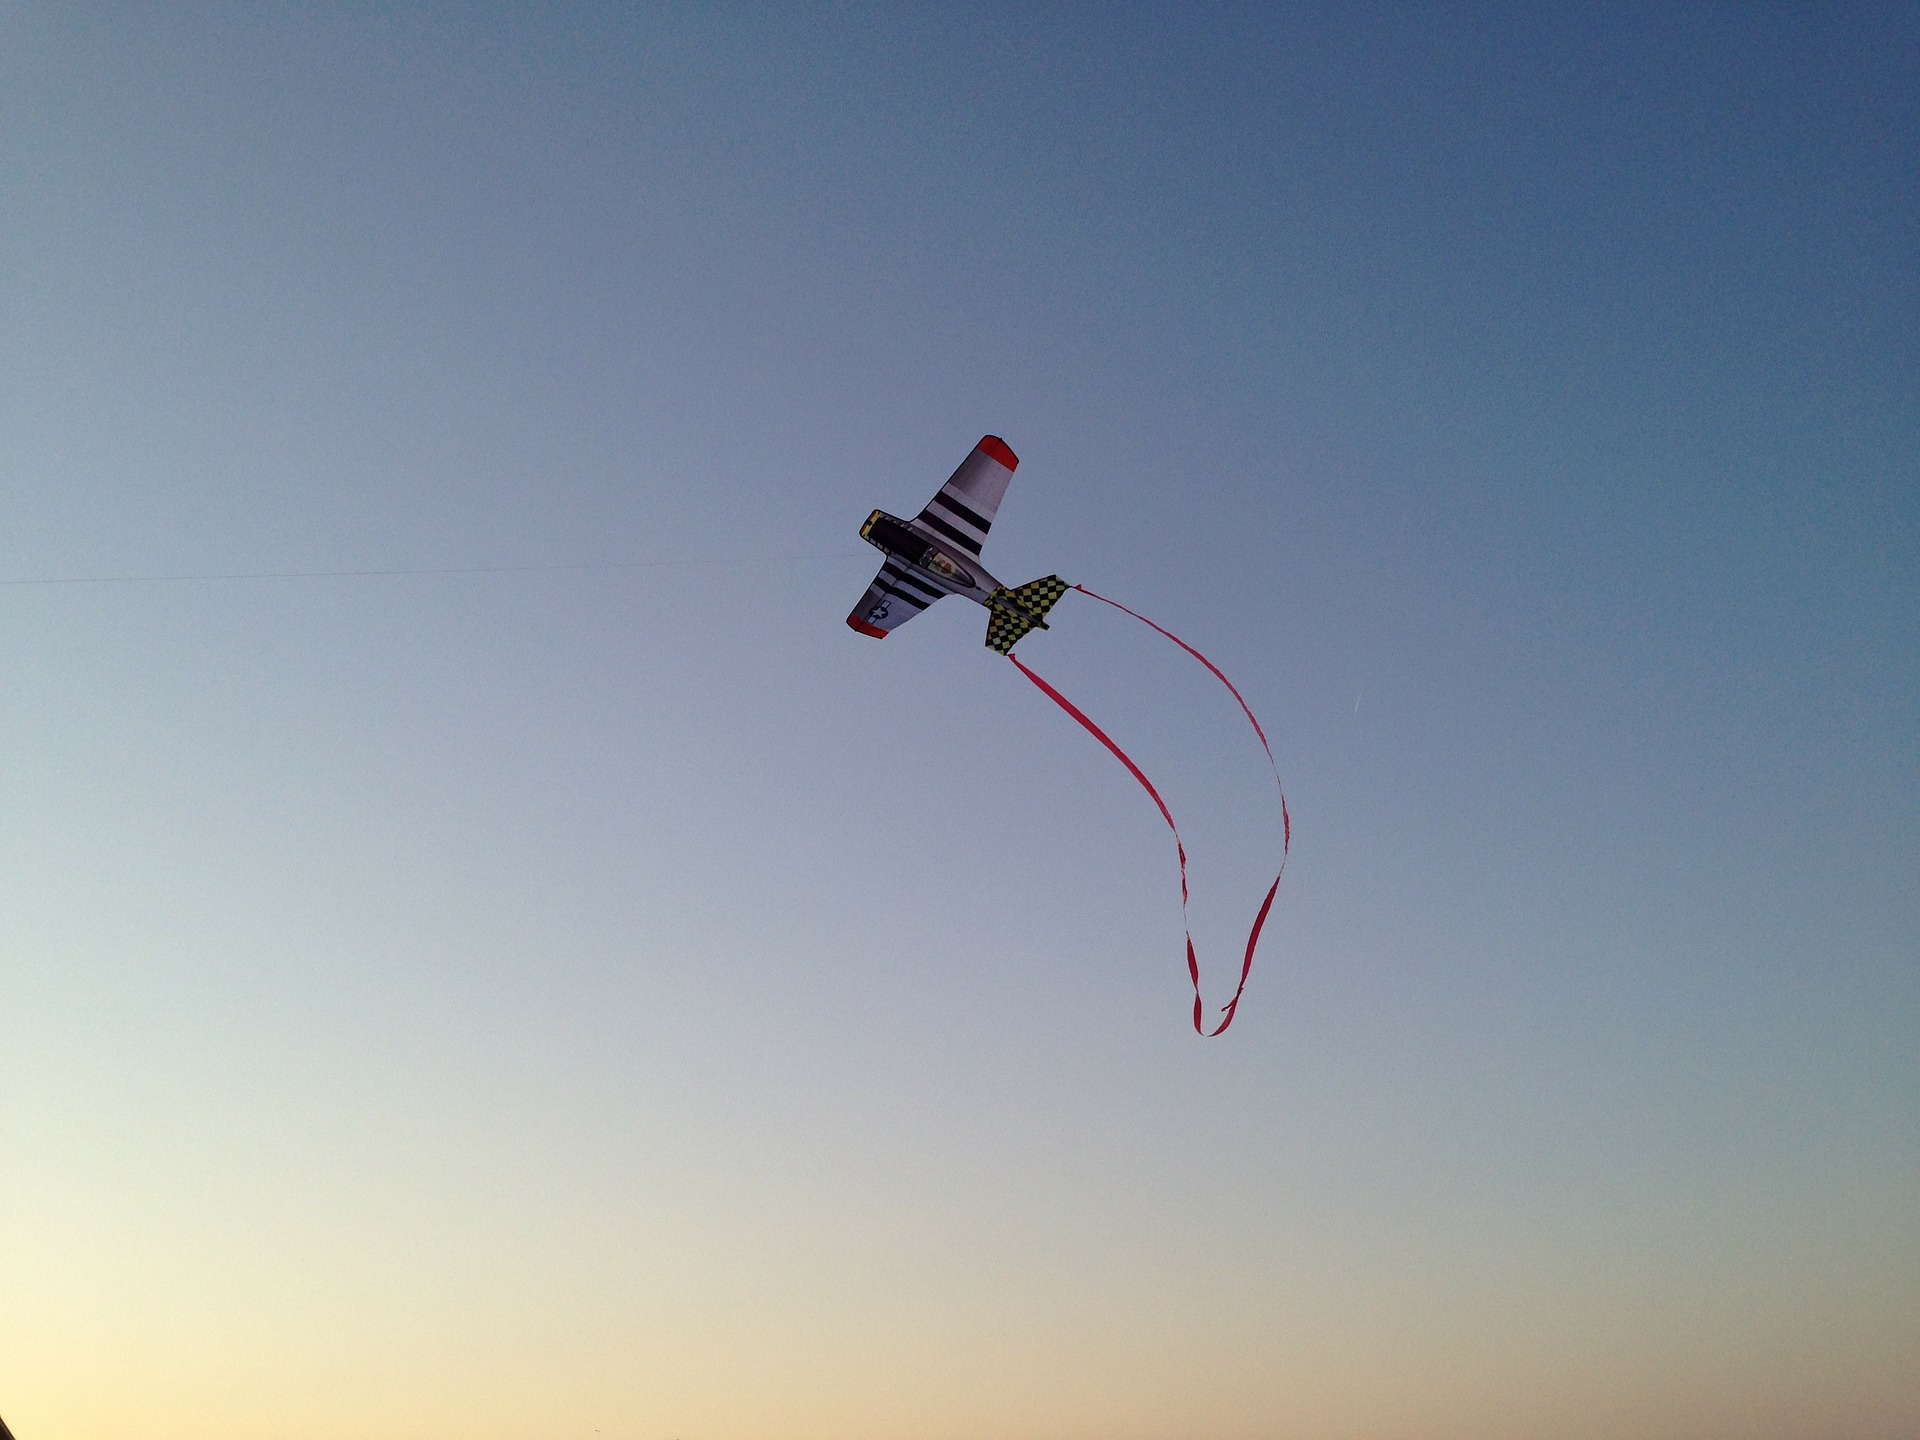 kite-197115_1920